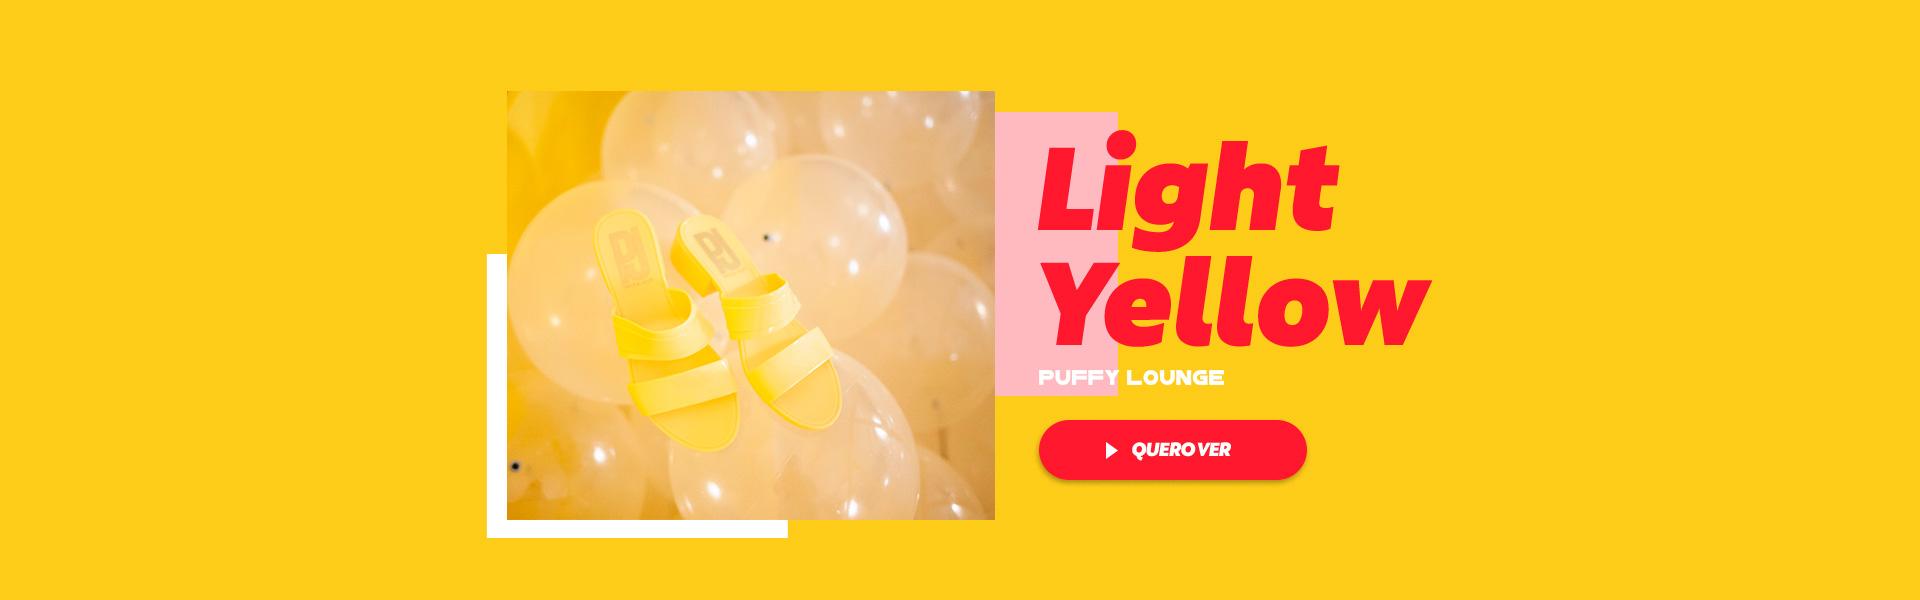 banner yellow